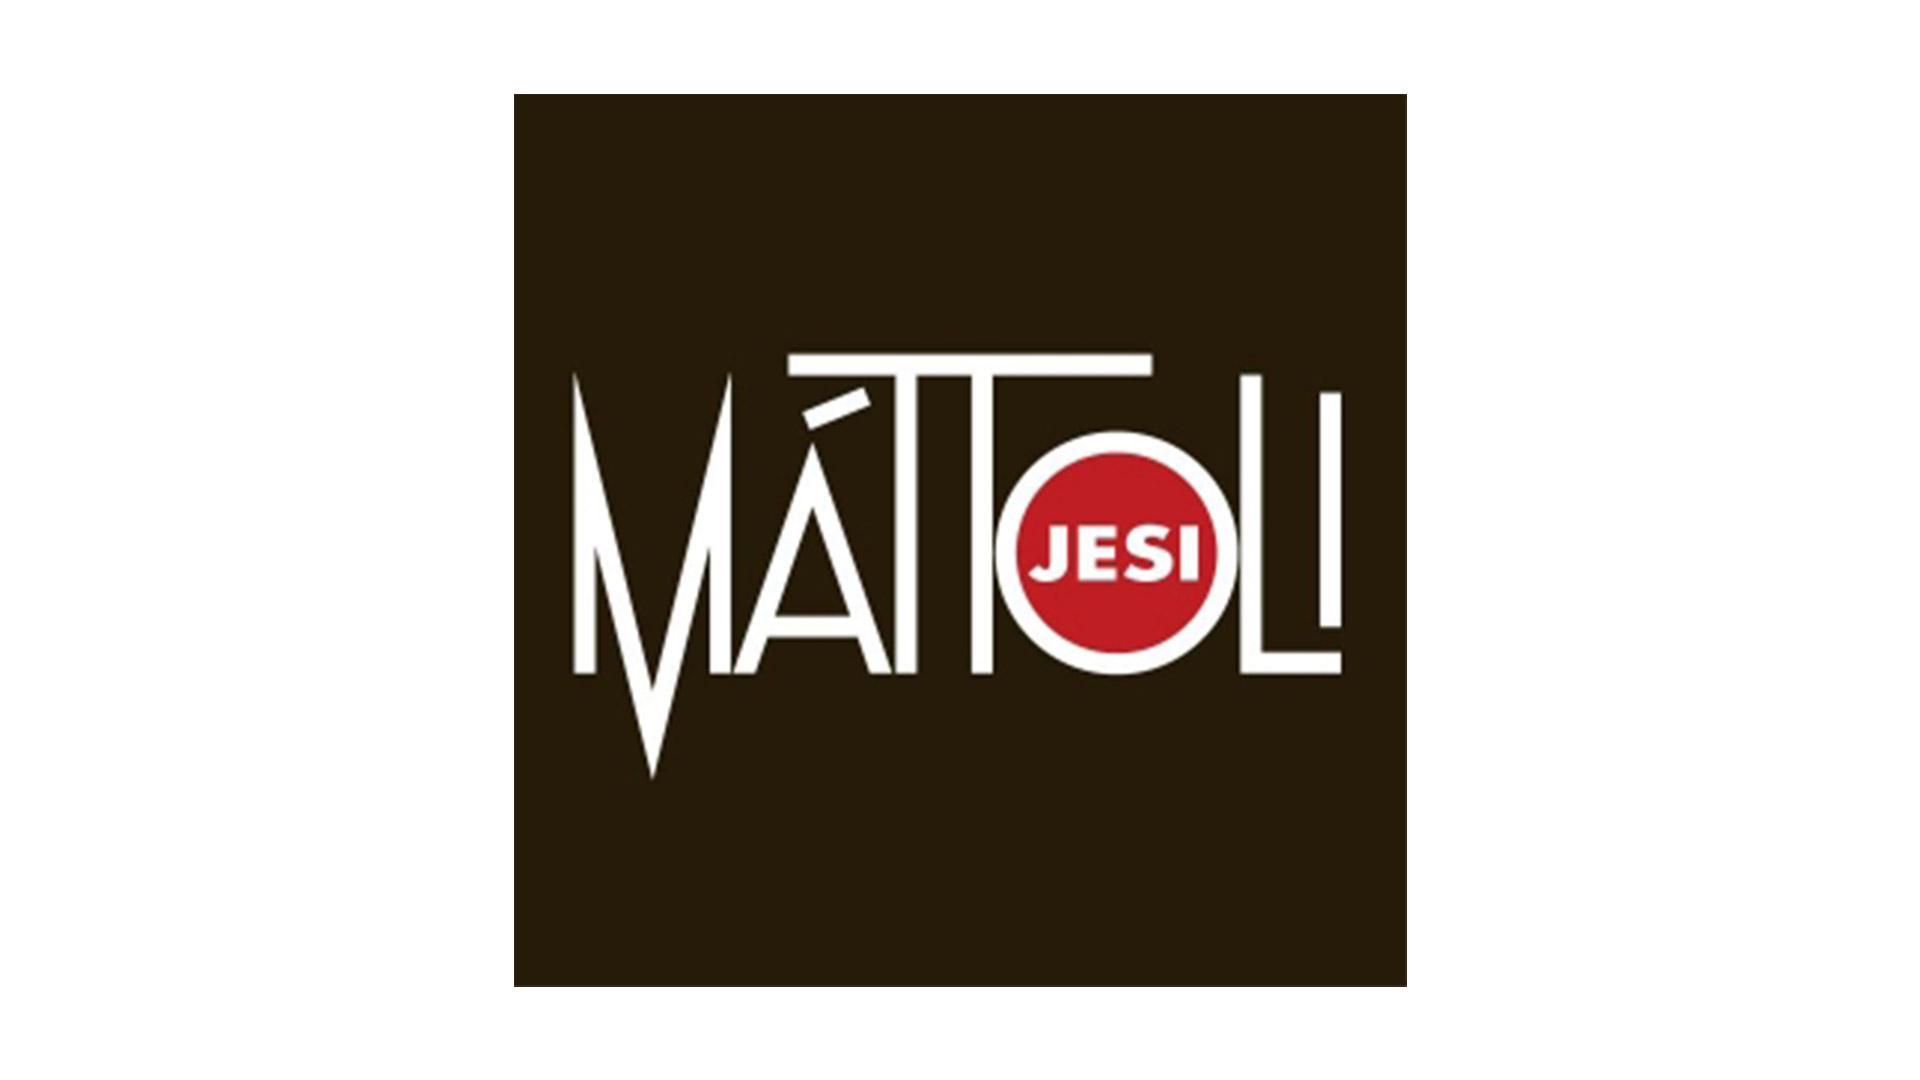 mattoli-logo